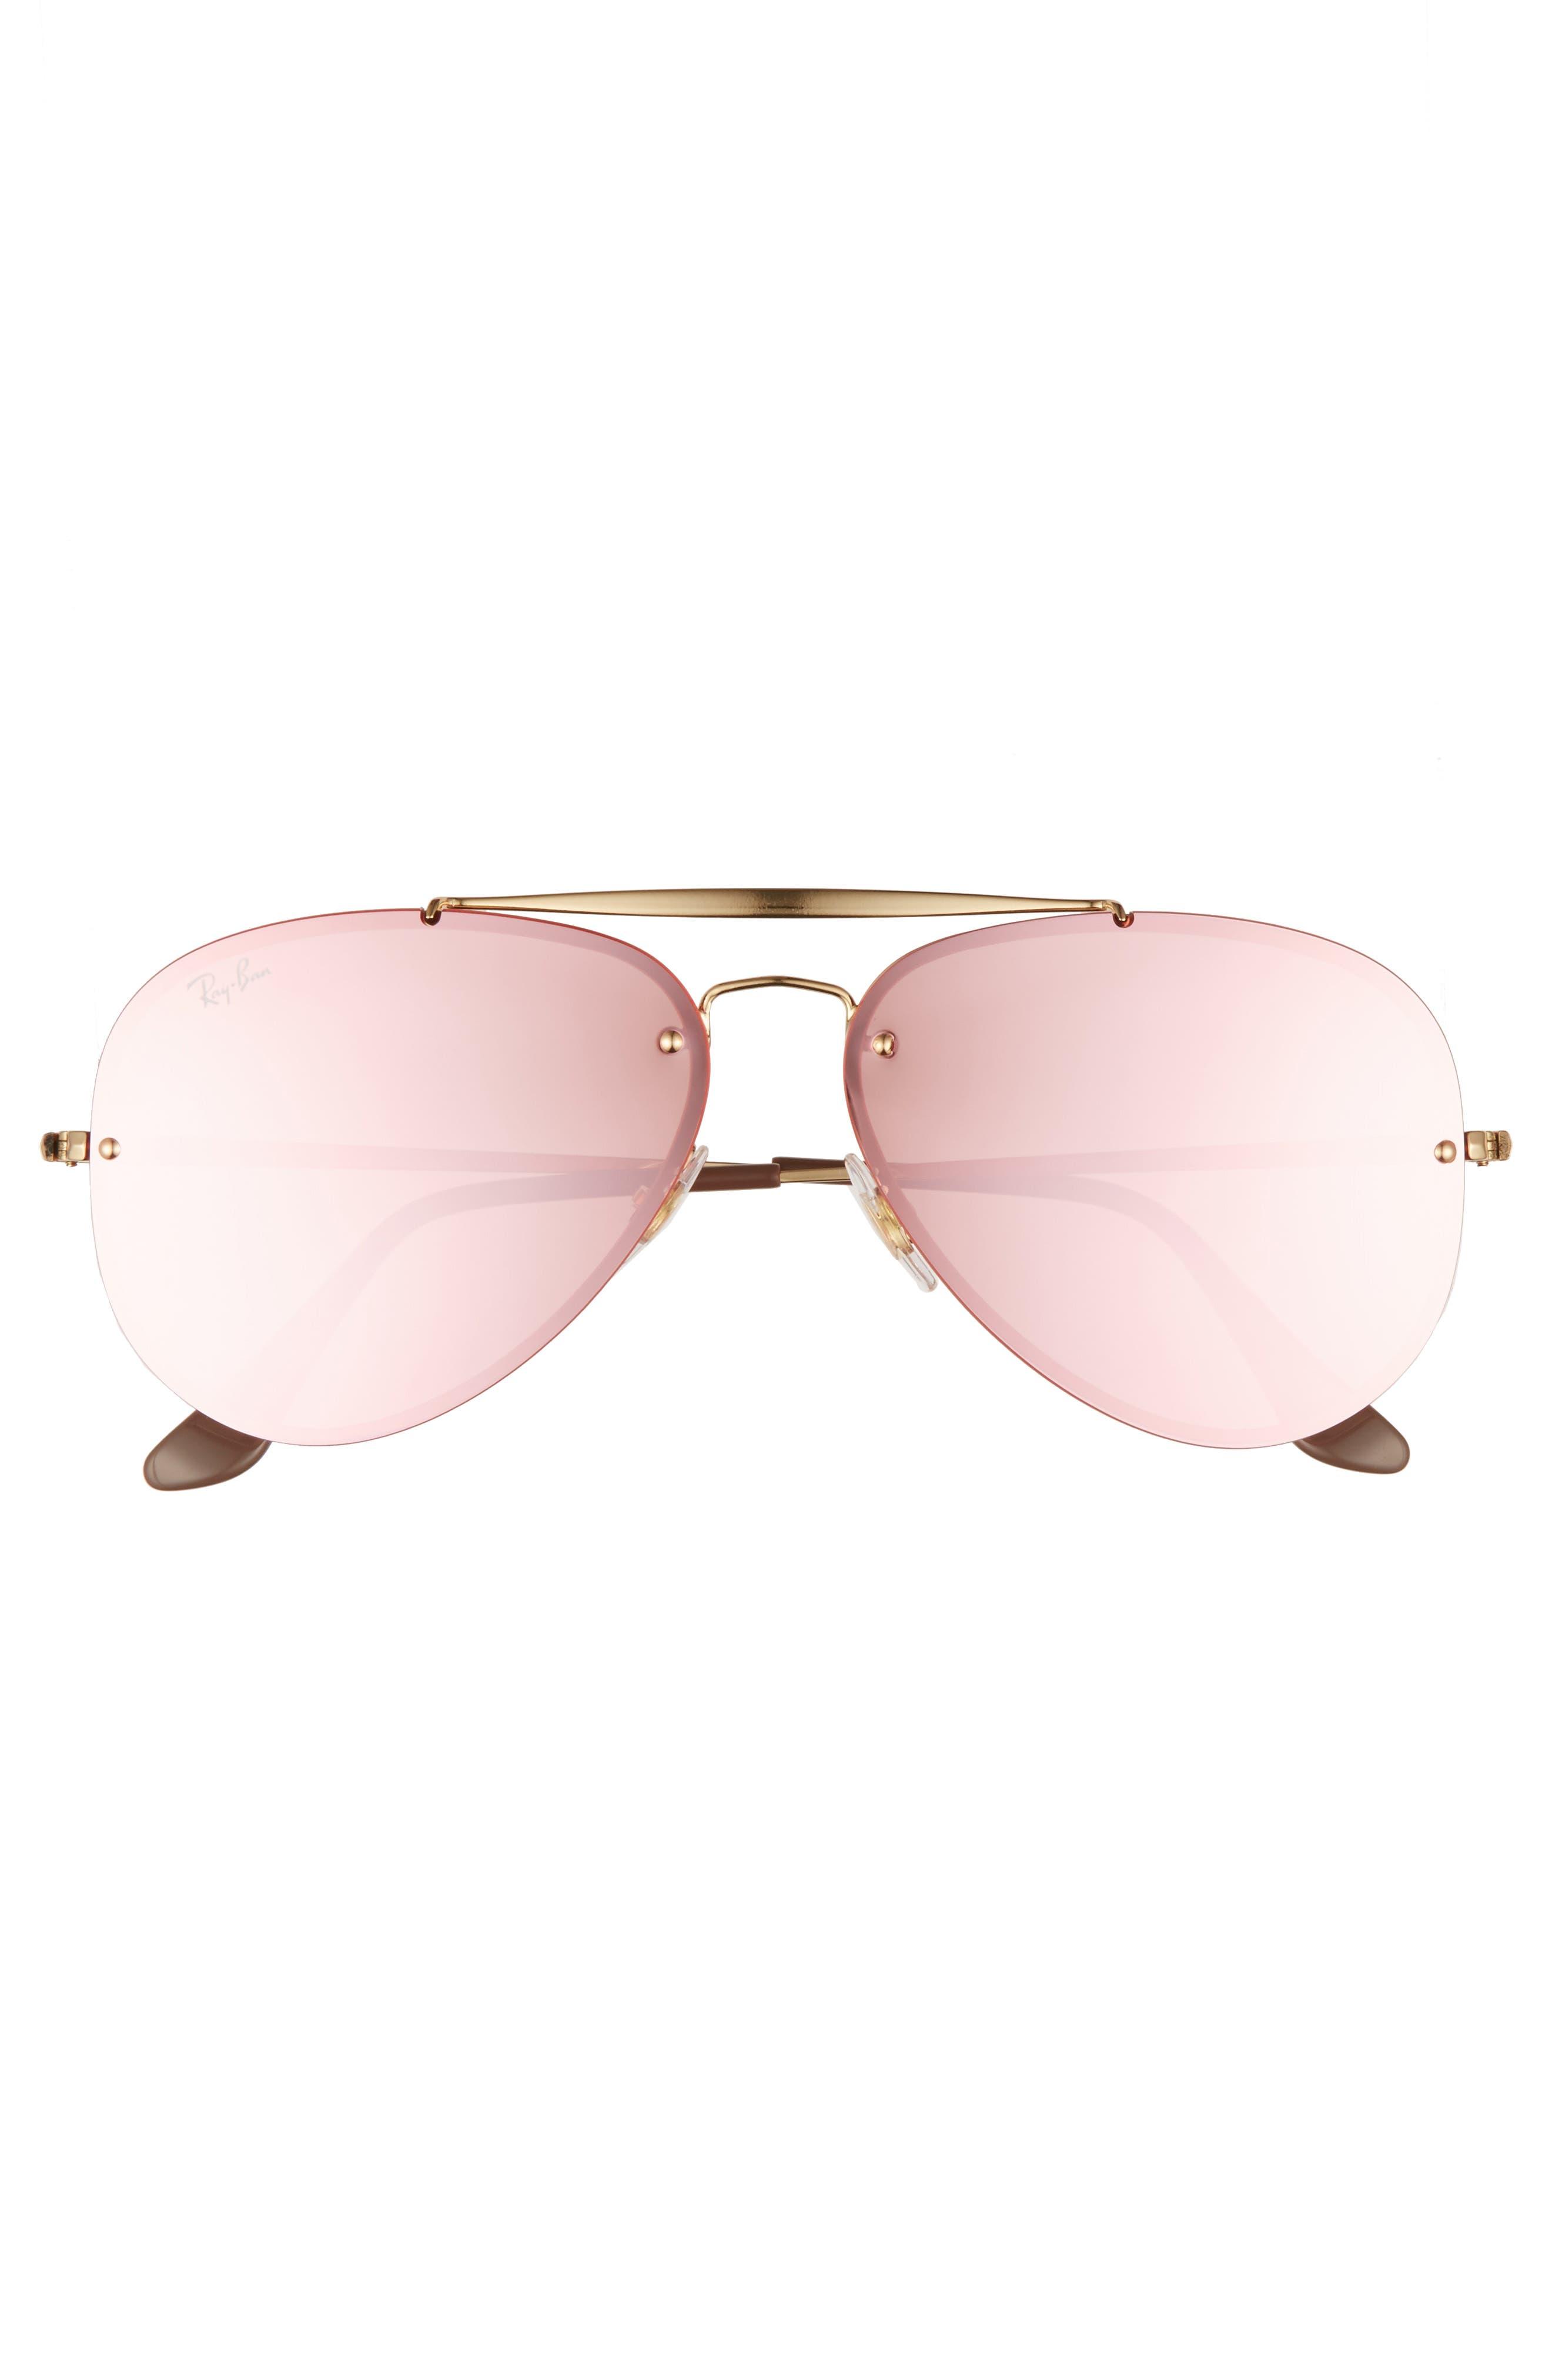 61mm Mirrored Lens Aviator Sunglasses,                             Alternate thumbnail 3, color,                             Gold Pink